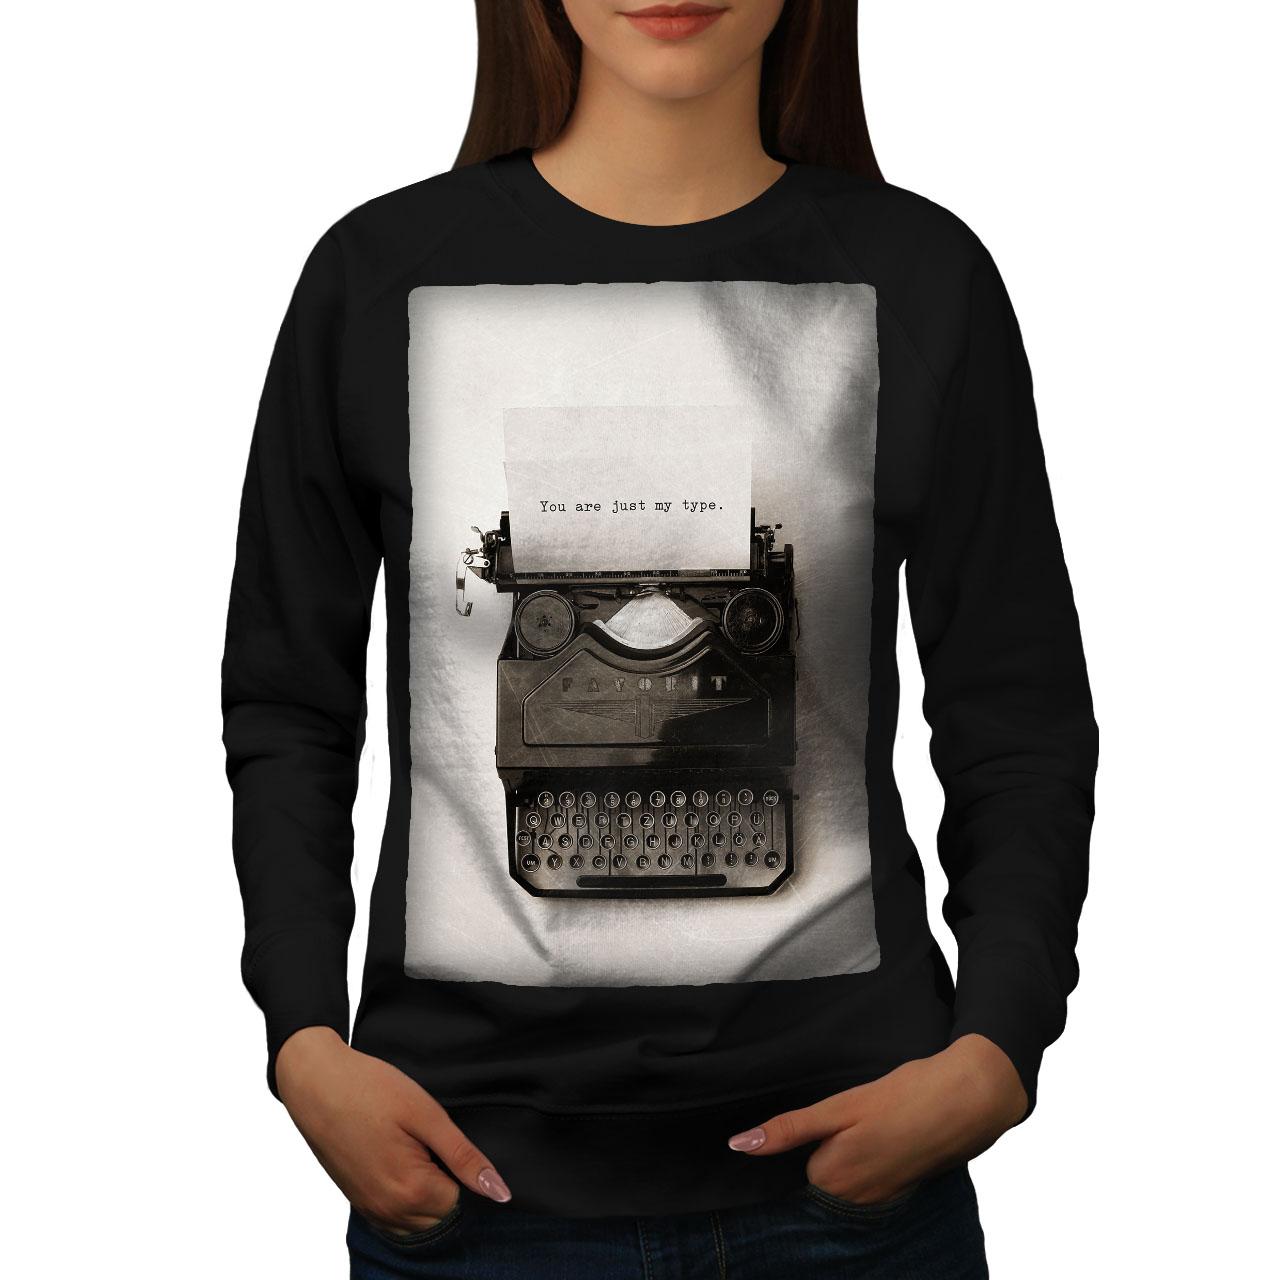 Retro Casual Pullover Jumper Wellcoda Vintage Instruments Womens Sweatshirt